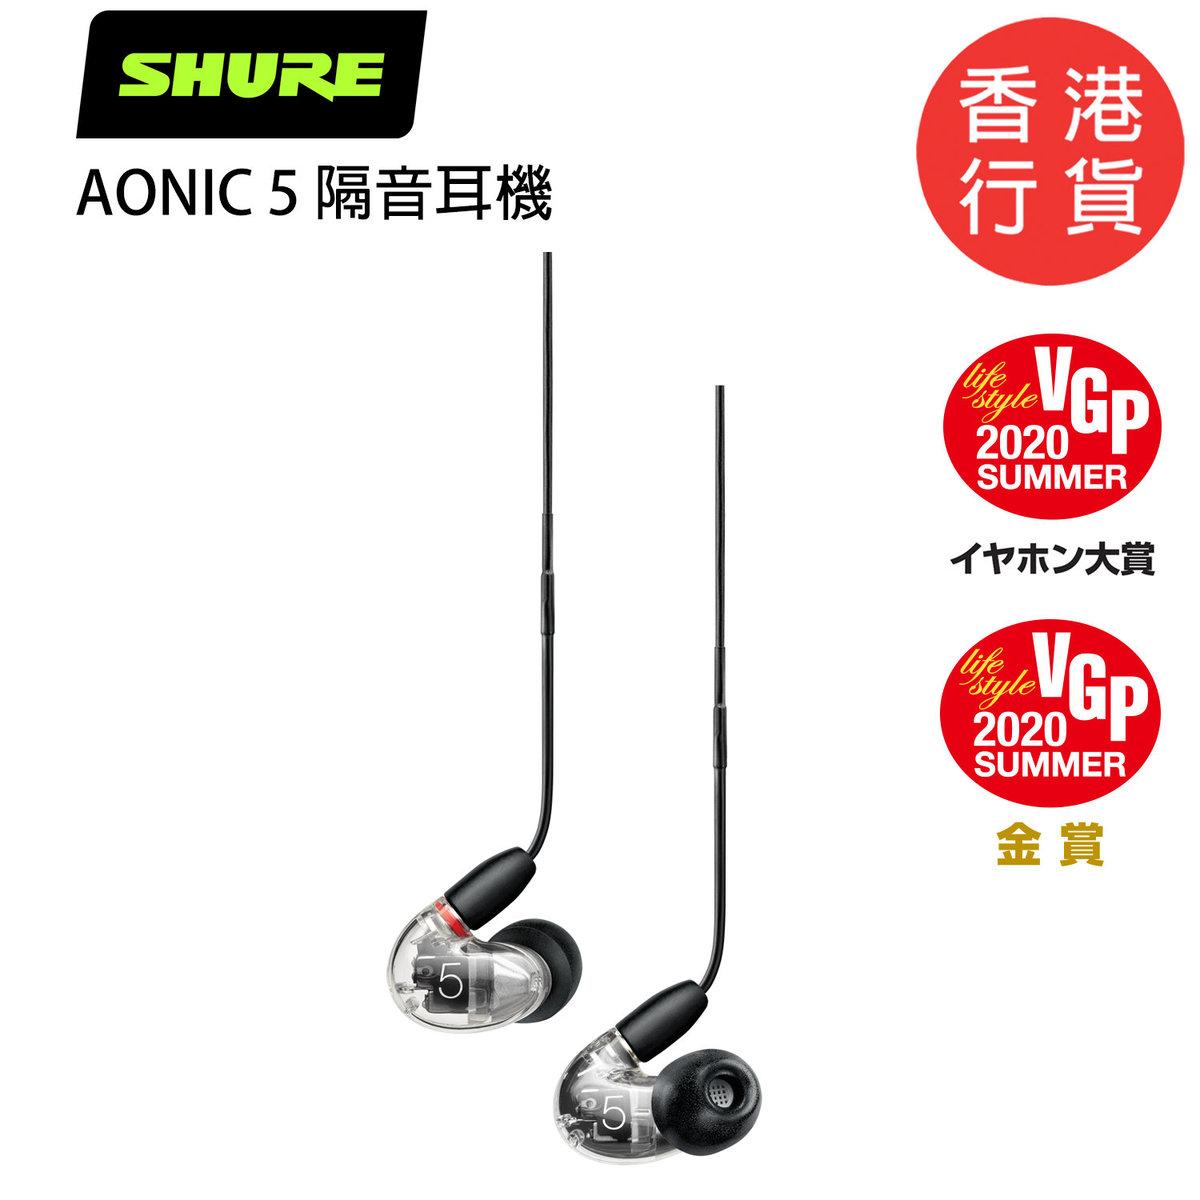 AONIC 5 專業隔音耳機 - 透明